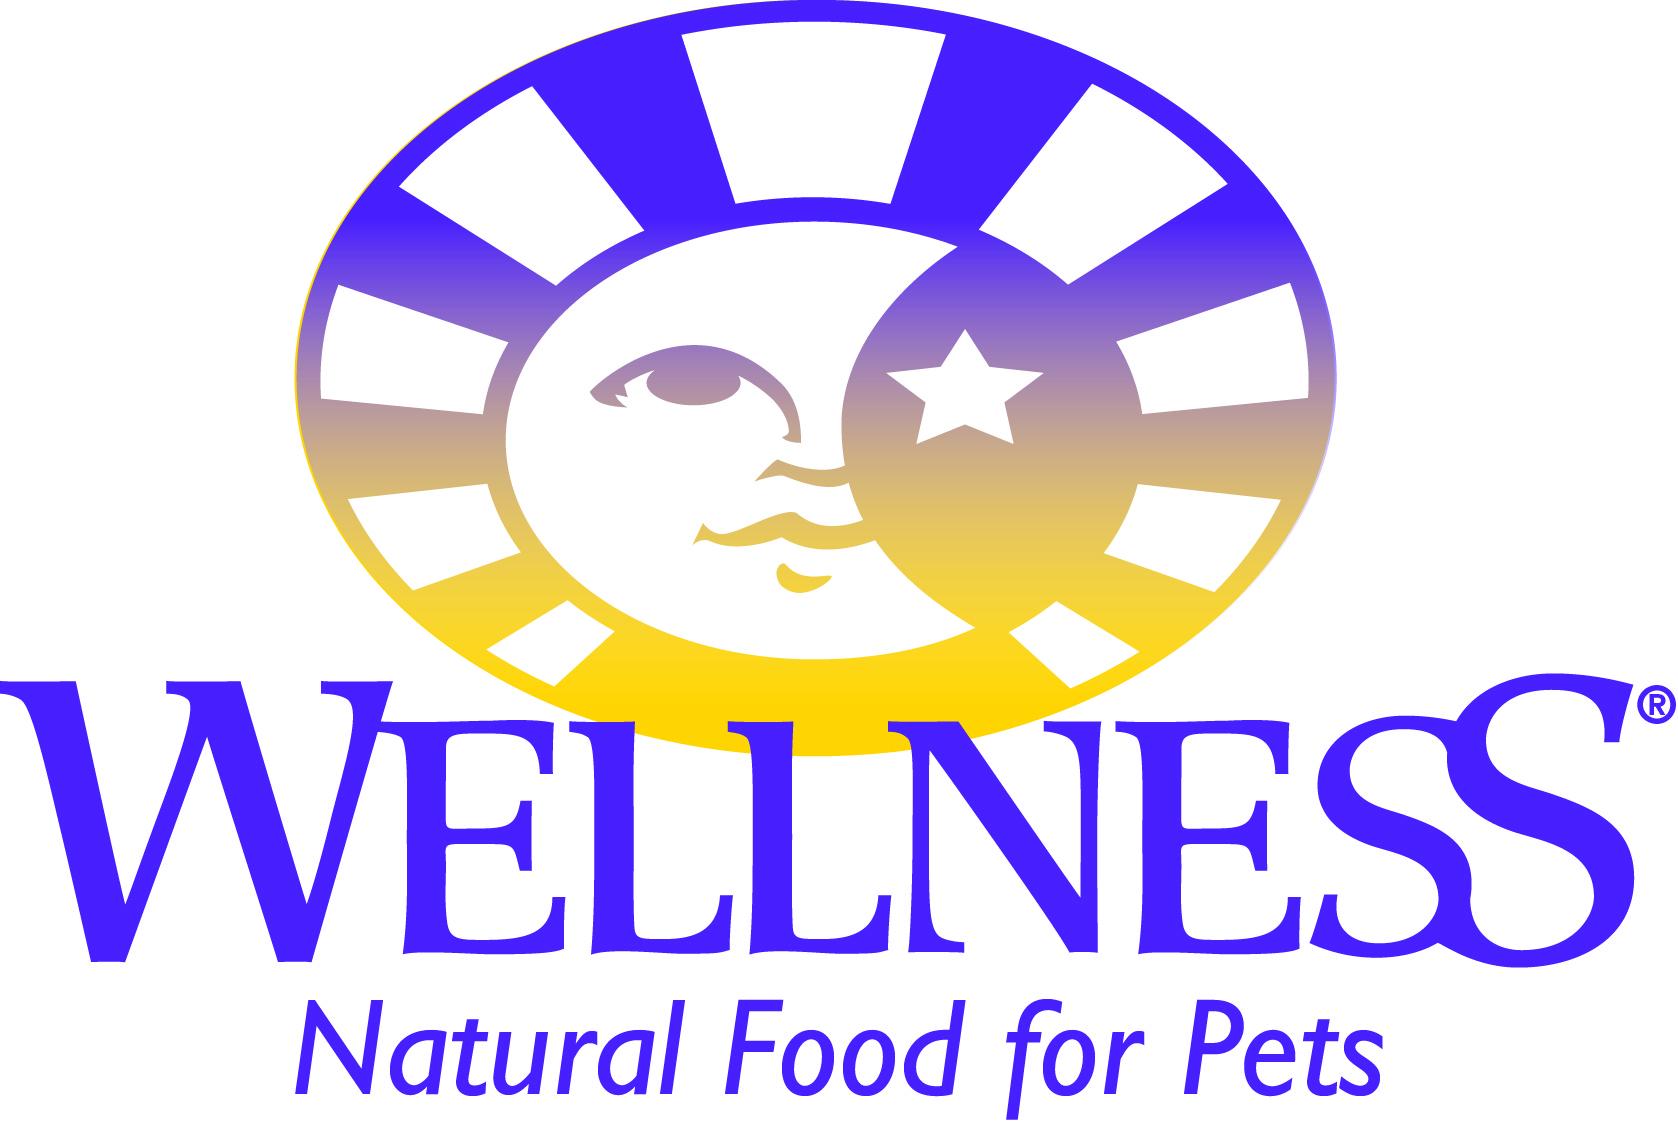 wellness-natural-pet-food-logo.jpg